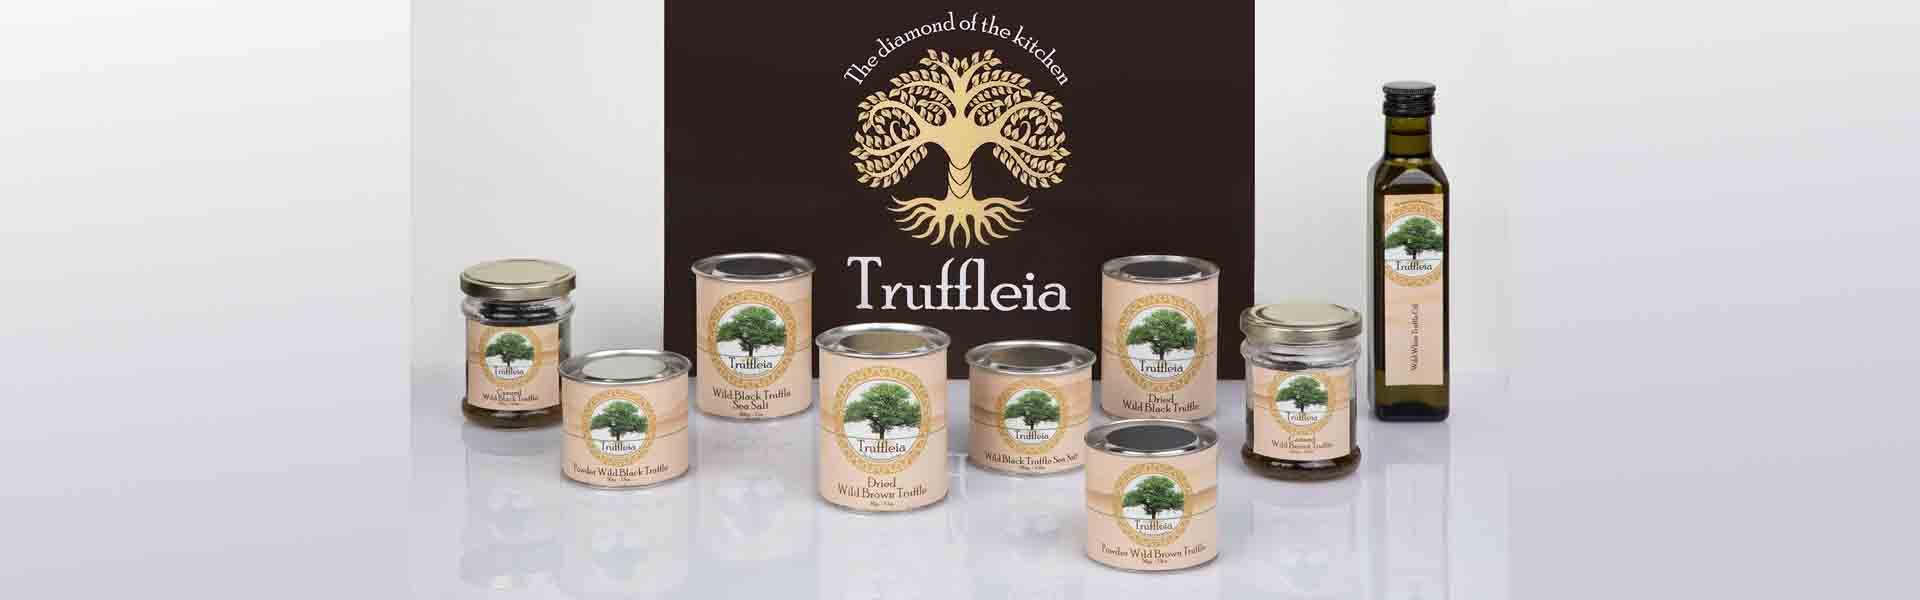 truffle-banner6